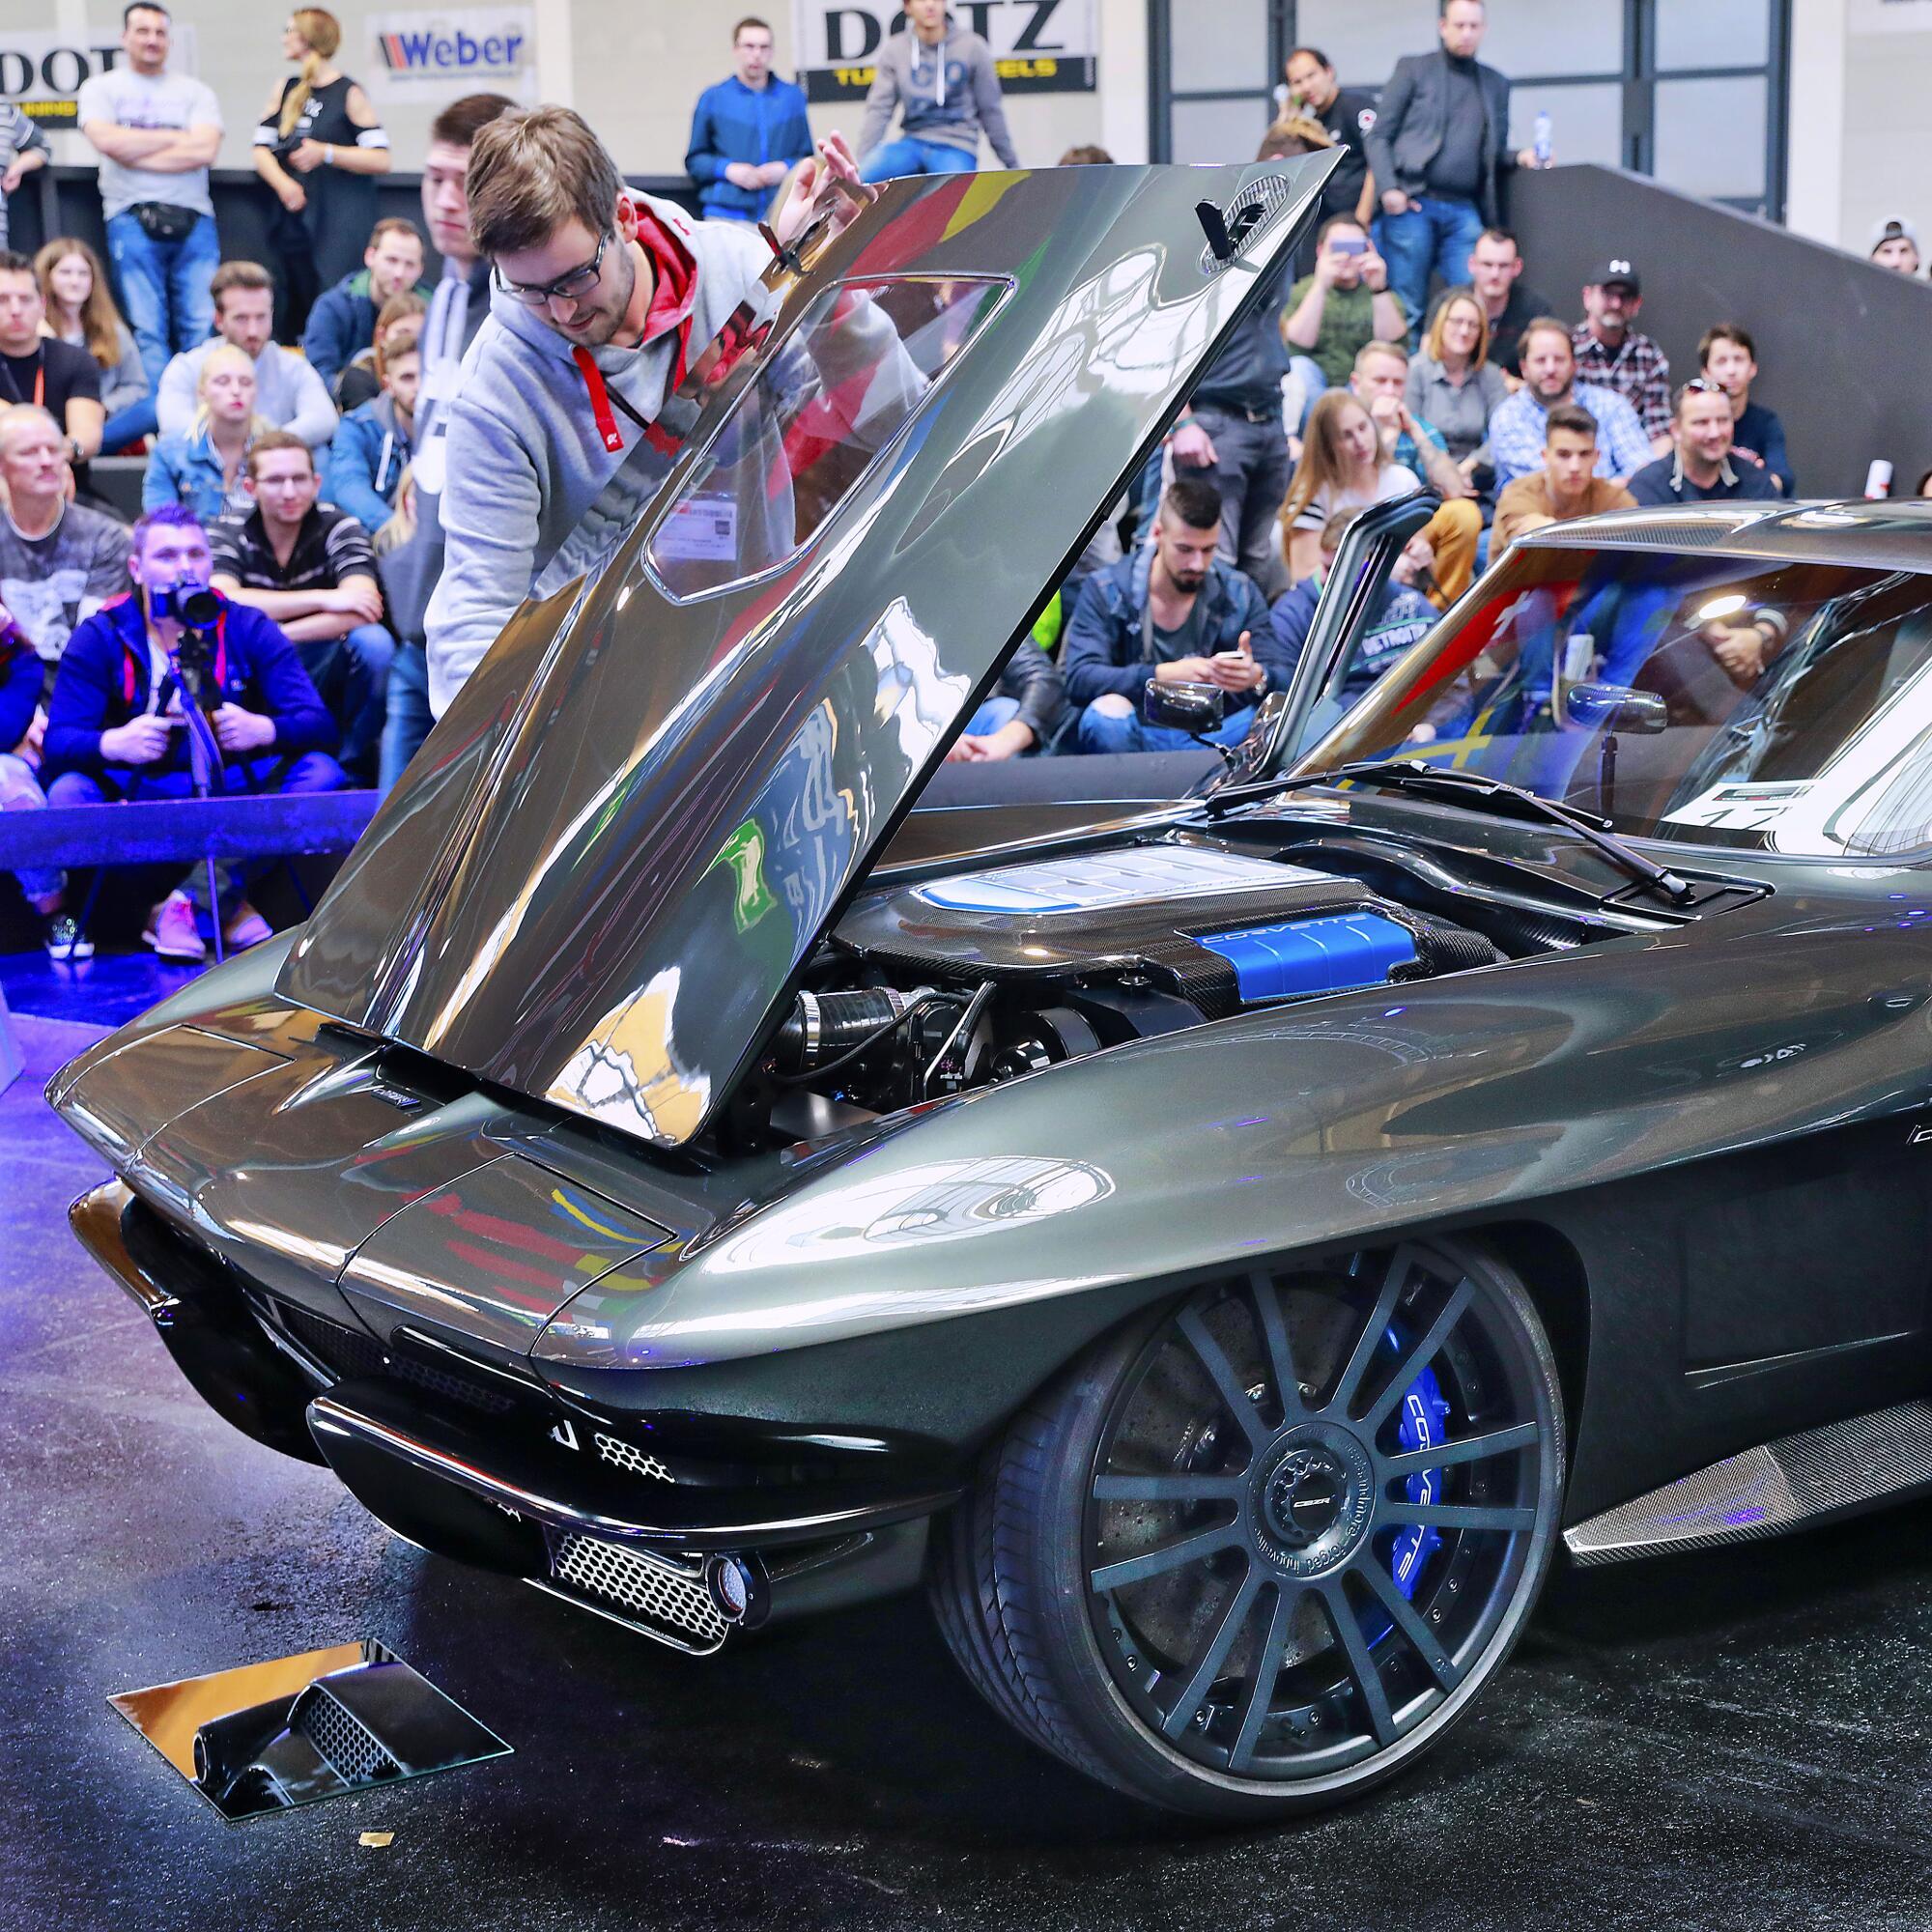 European Tuning Showdown Chevrolet Corvette 2 Tuning World